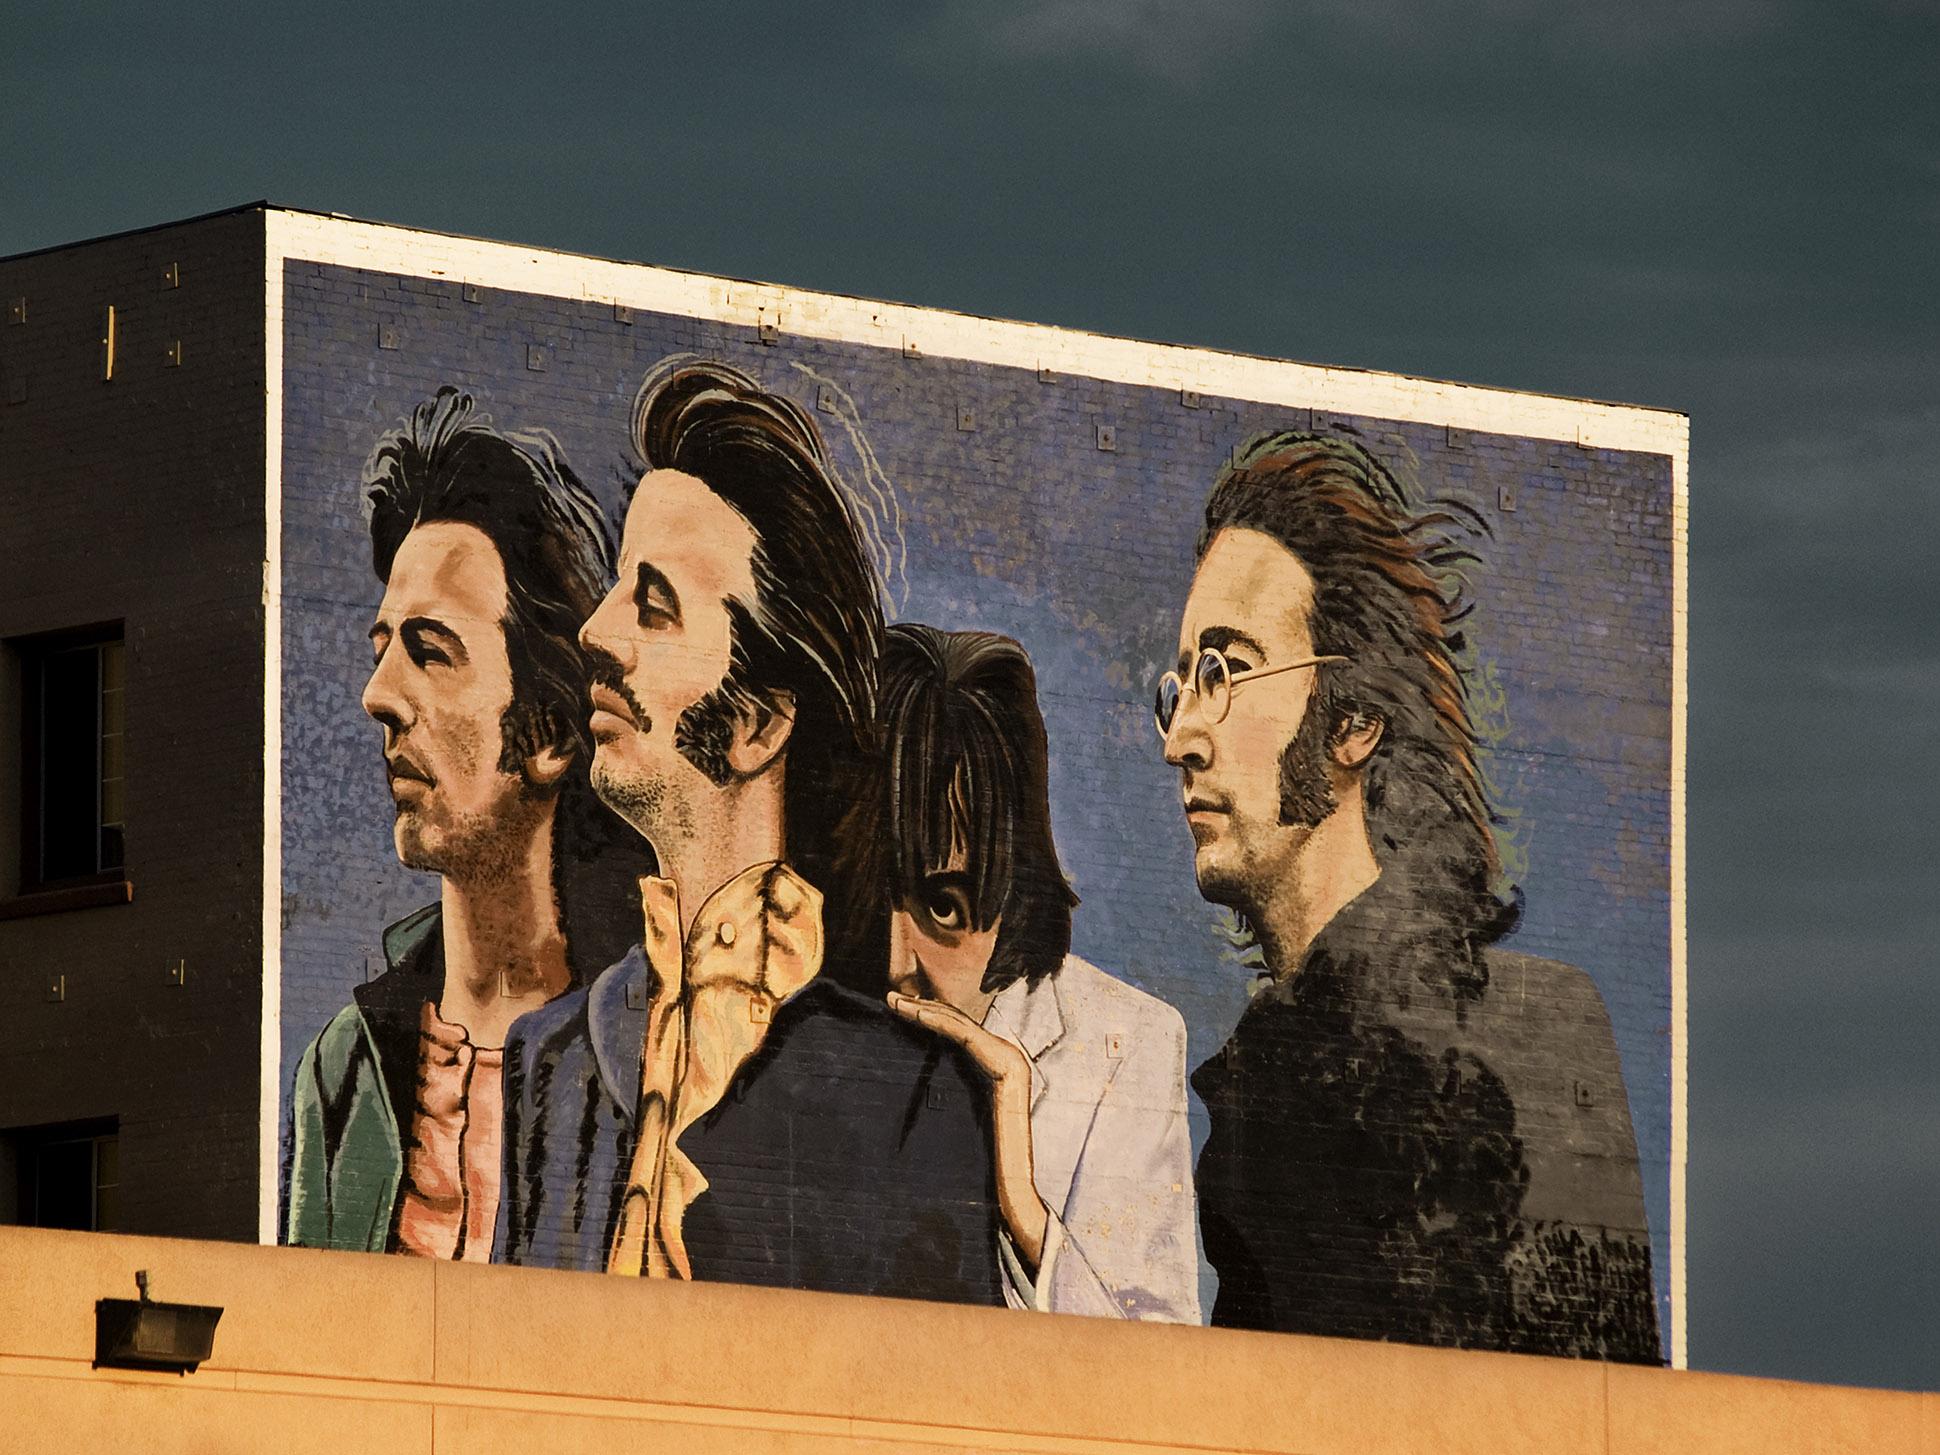 Graffiti mural of The Beatles (John Lennon, Paul McCartney, George Harrison and Ringo Starr) by Debbie Sears